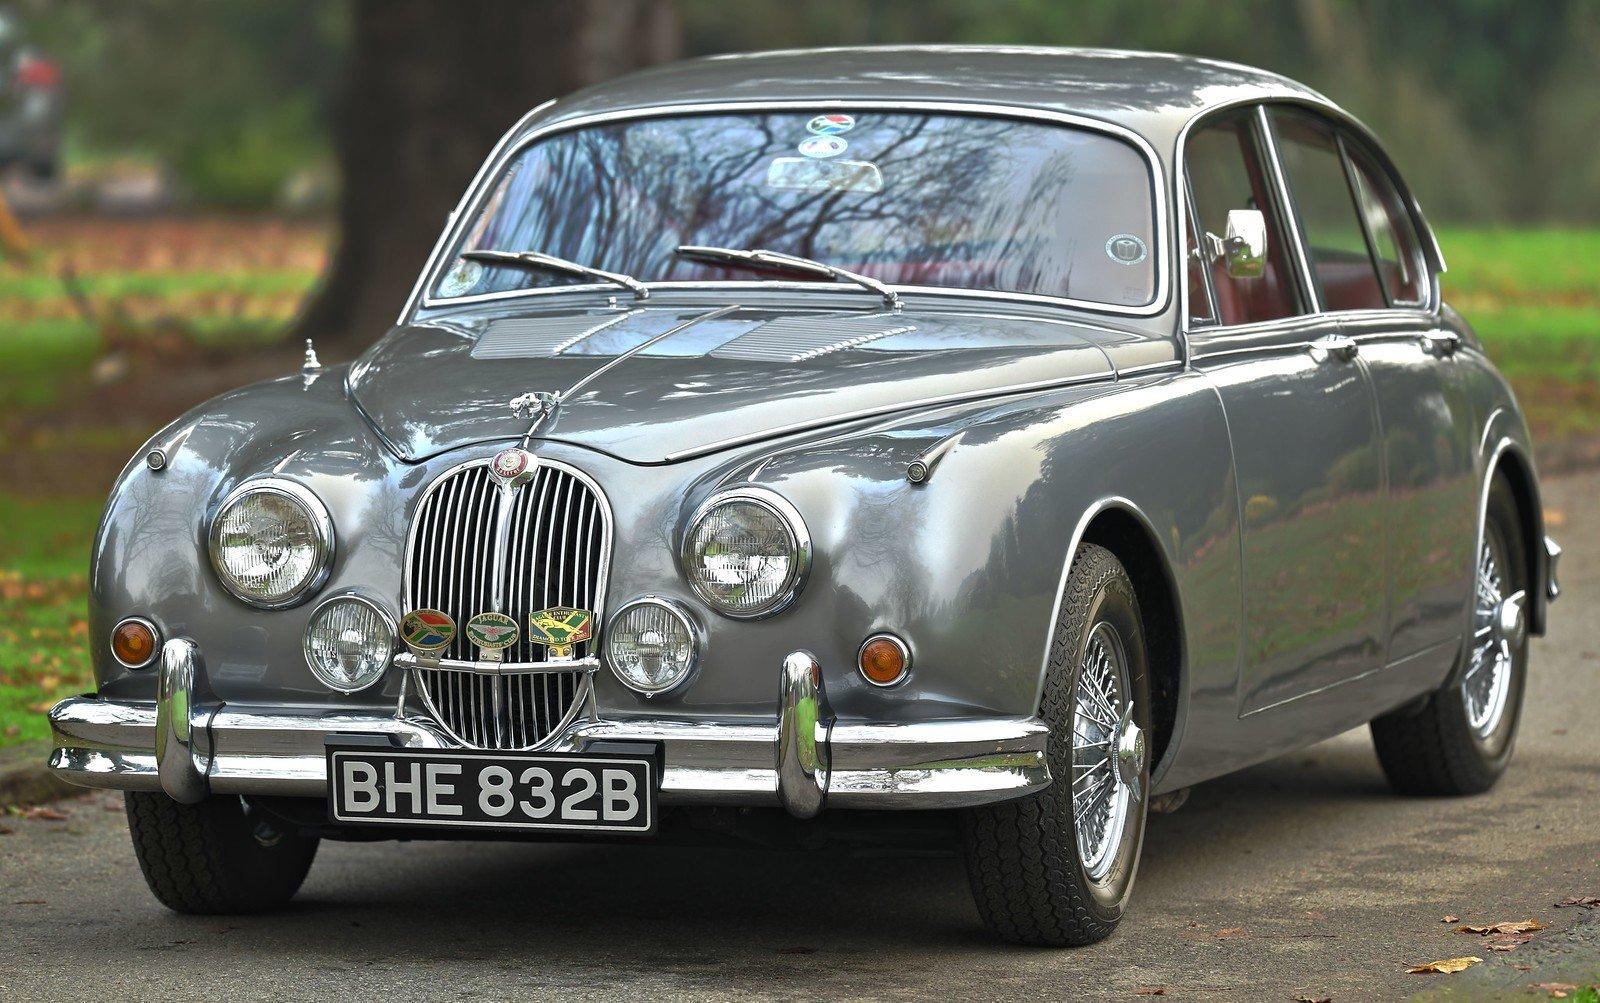 1965 Jaguar Mark II 3.8 SOLD (picture 1 of 6)